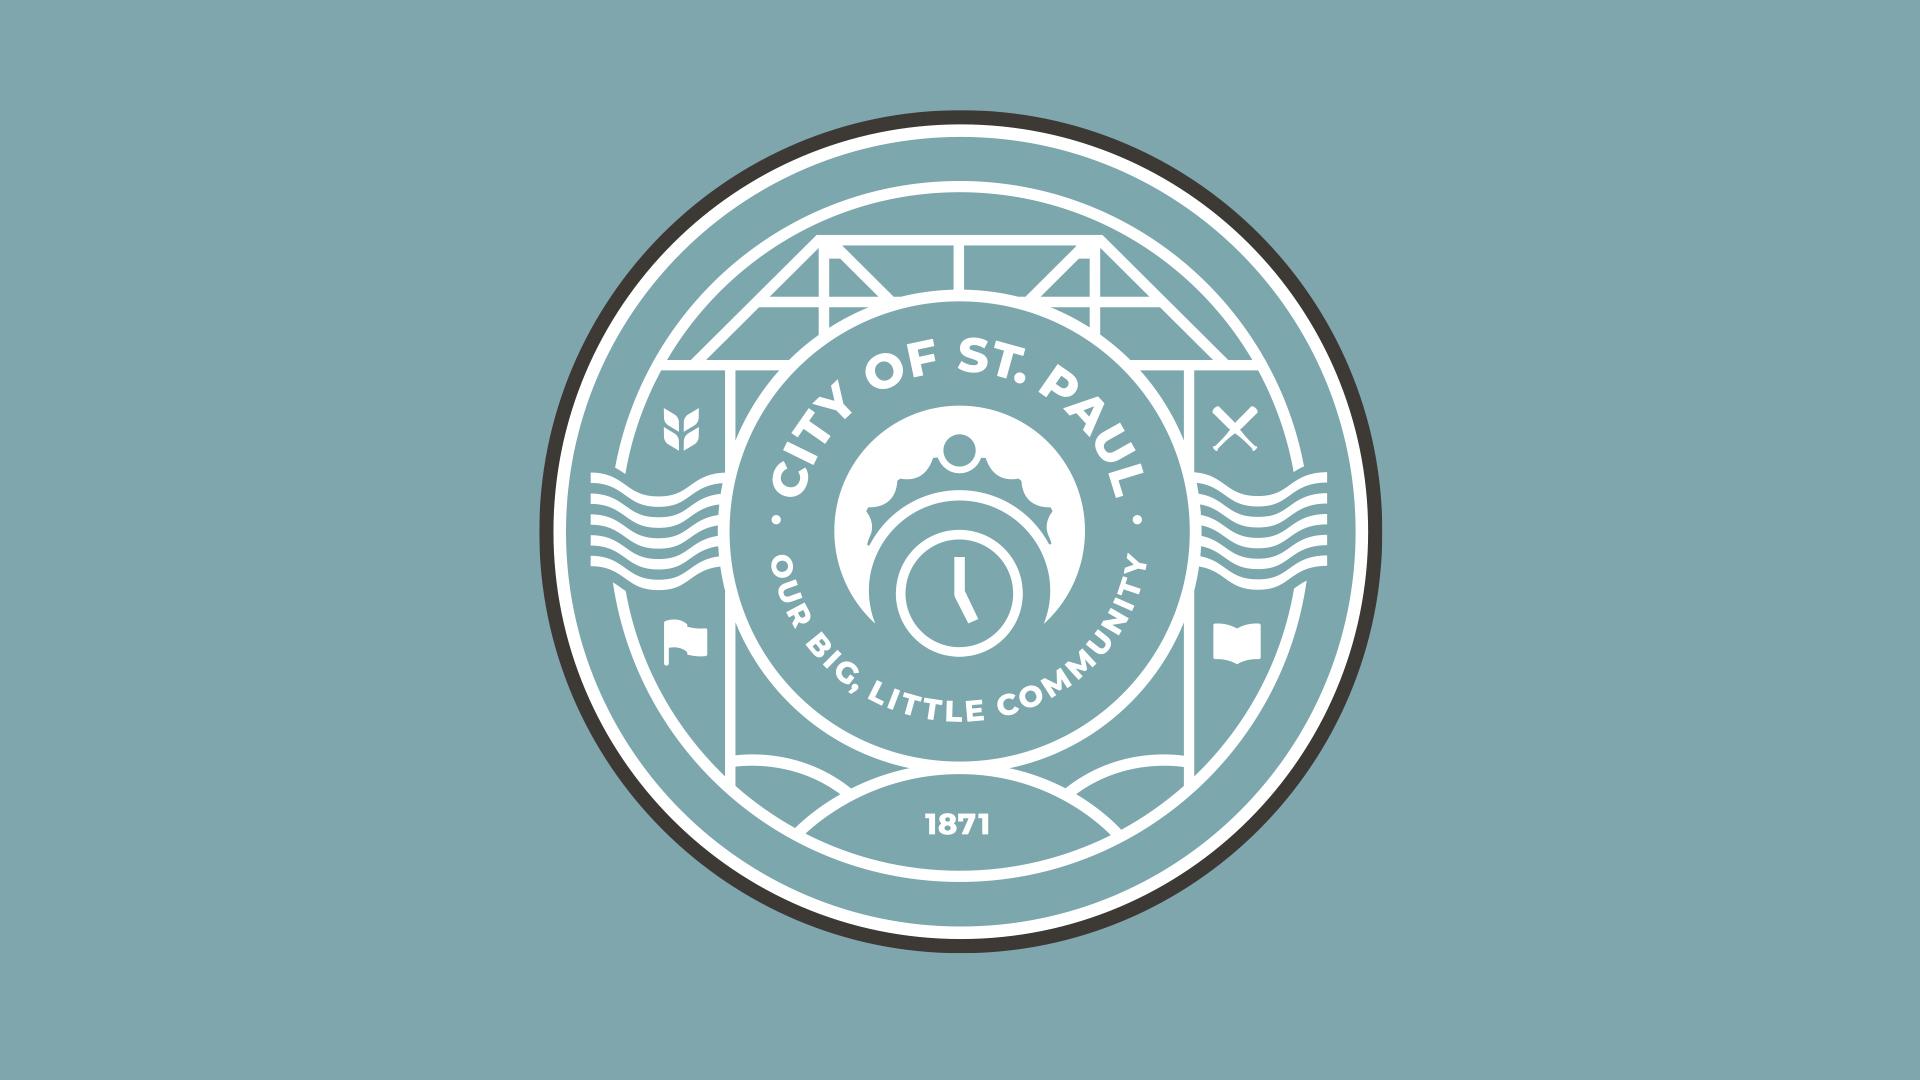 Image of the new St. Paul, Nebraska city seal.